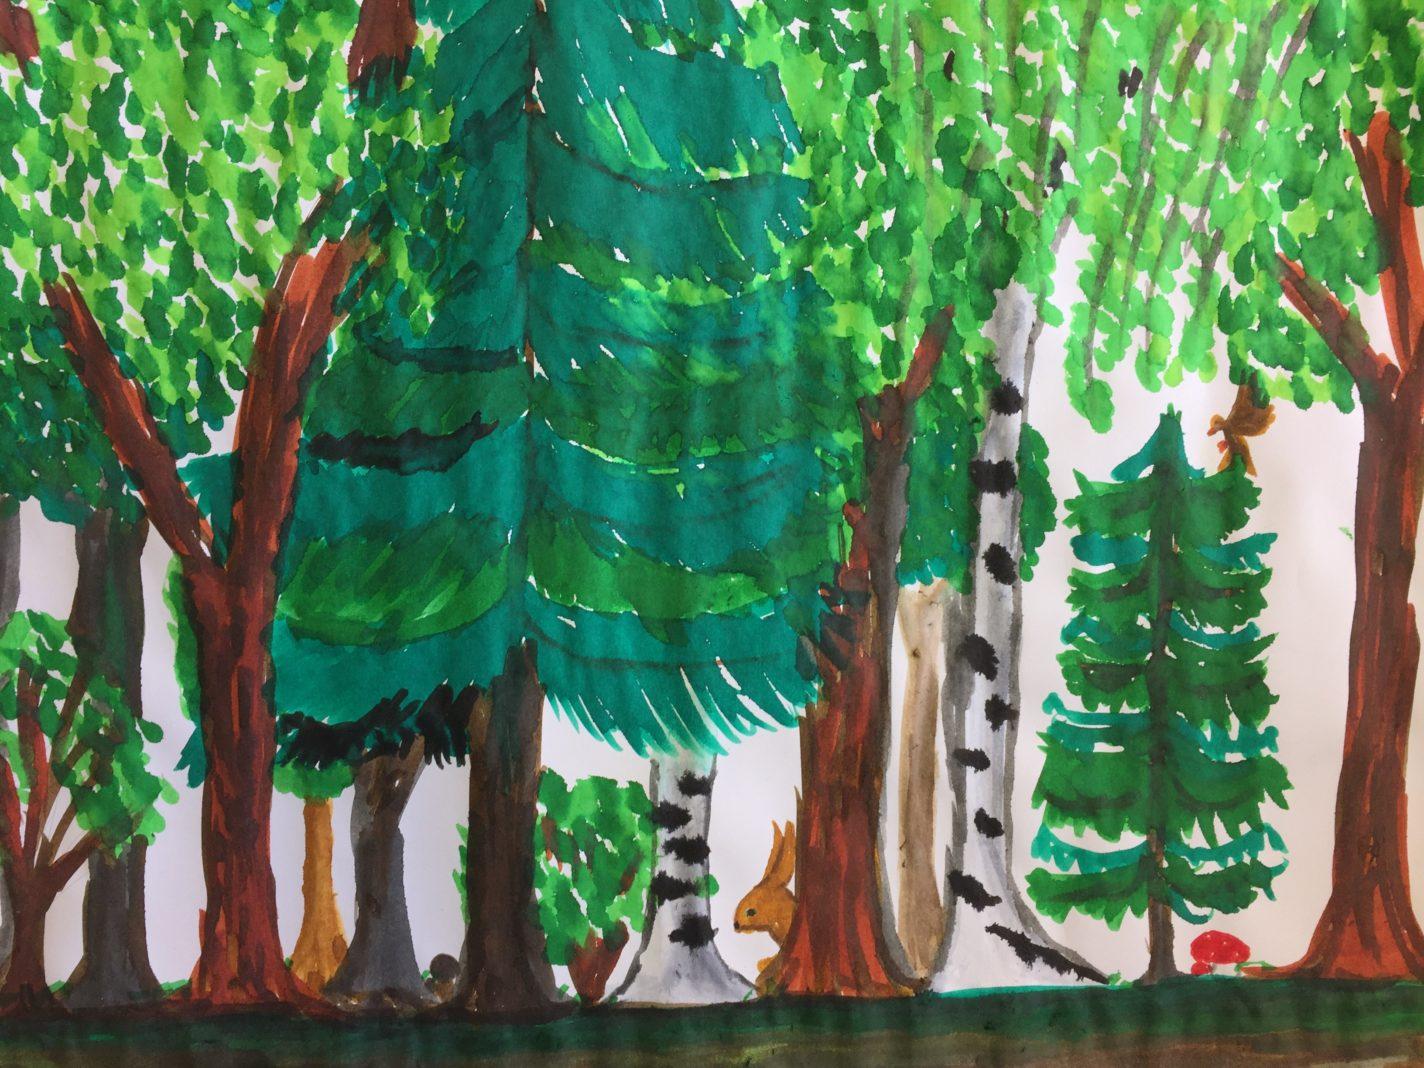 Waldkalender von Arleen Brunke